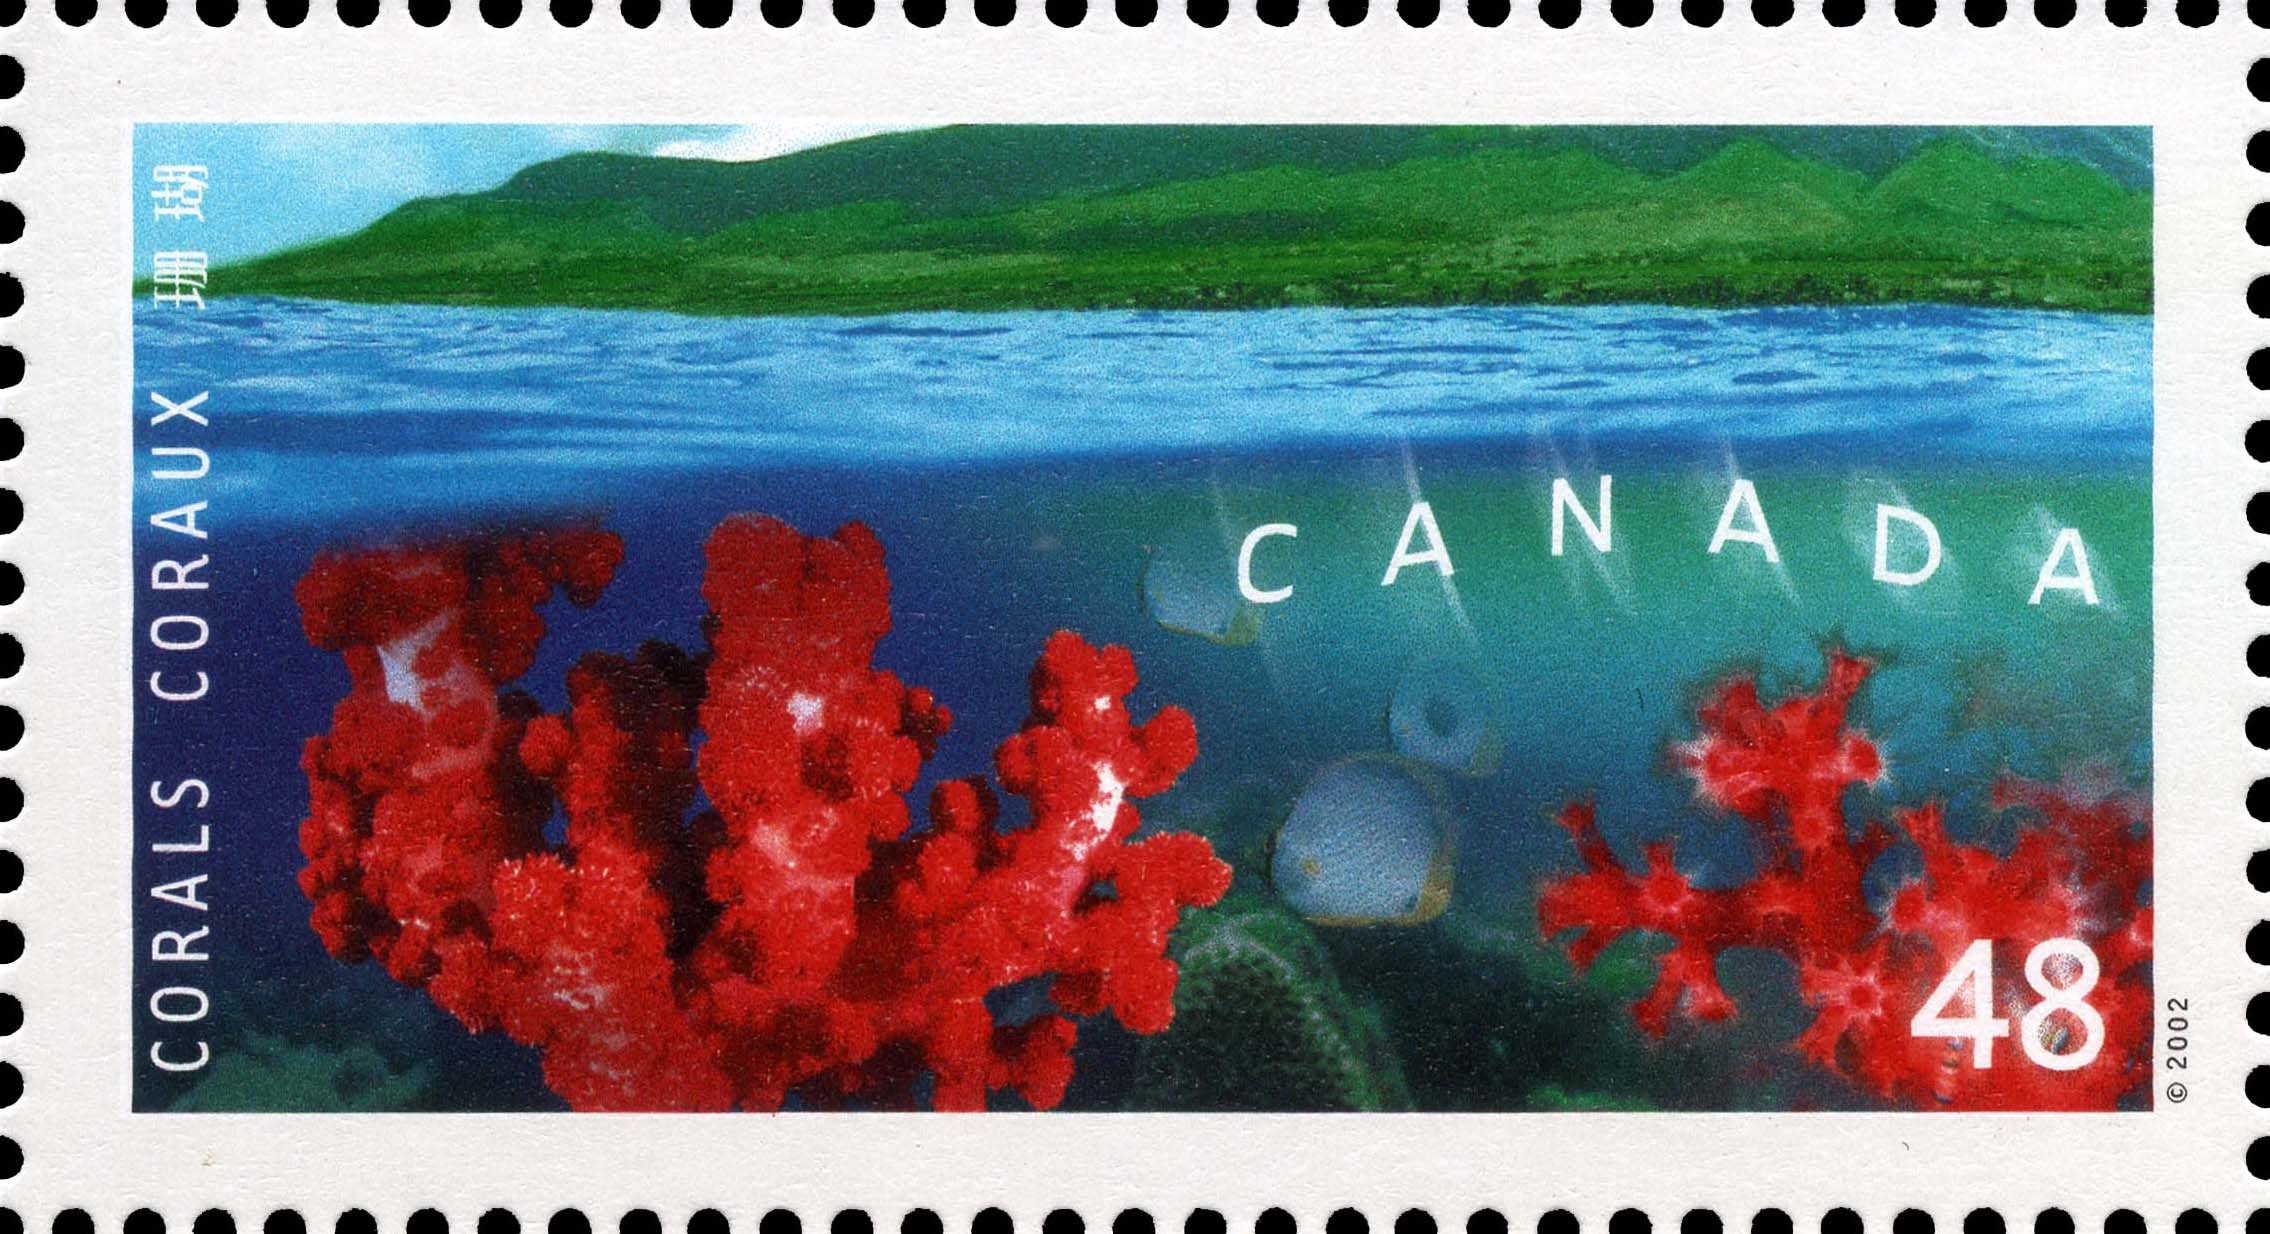 Dendronepthea gigantea and Dendronepthea Canada Postage Stamp | Corals